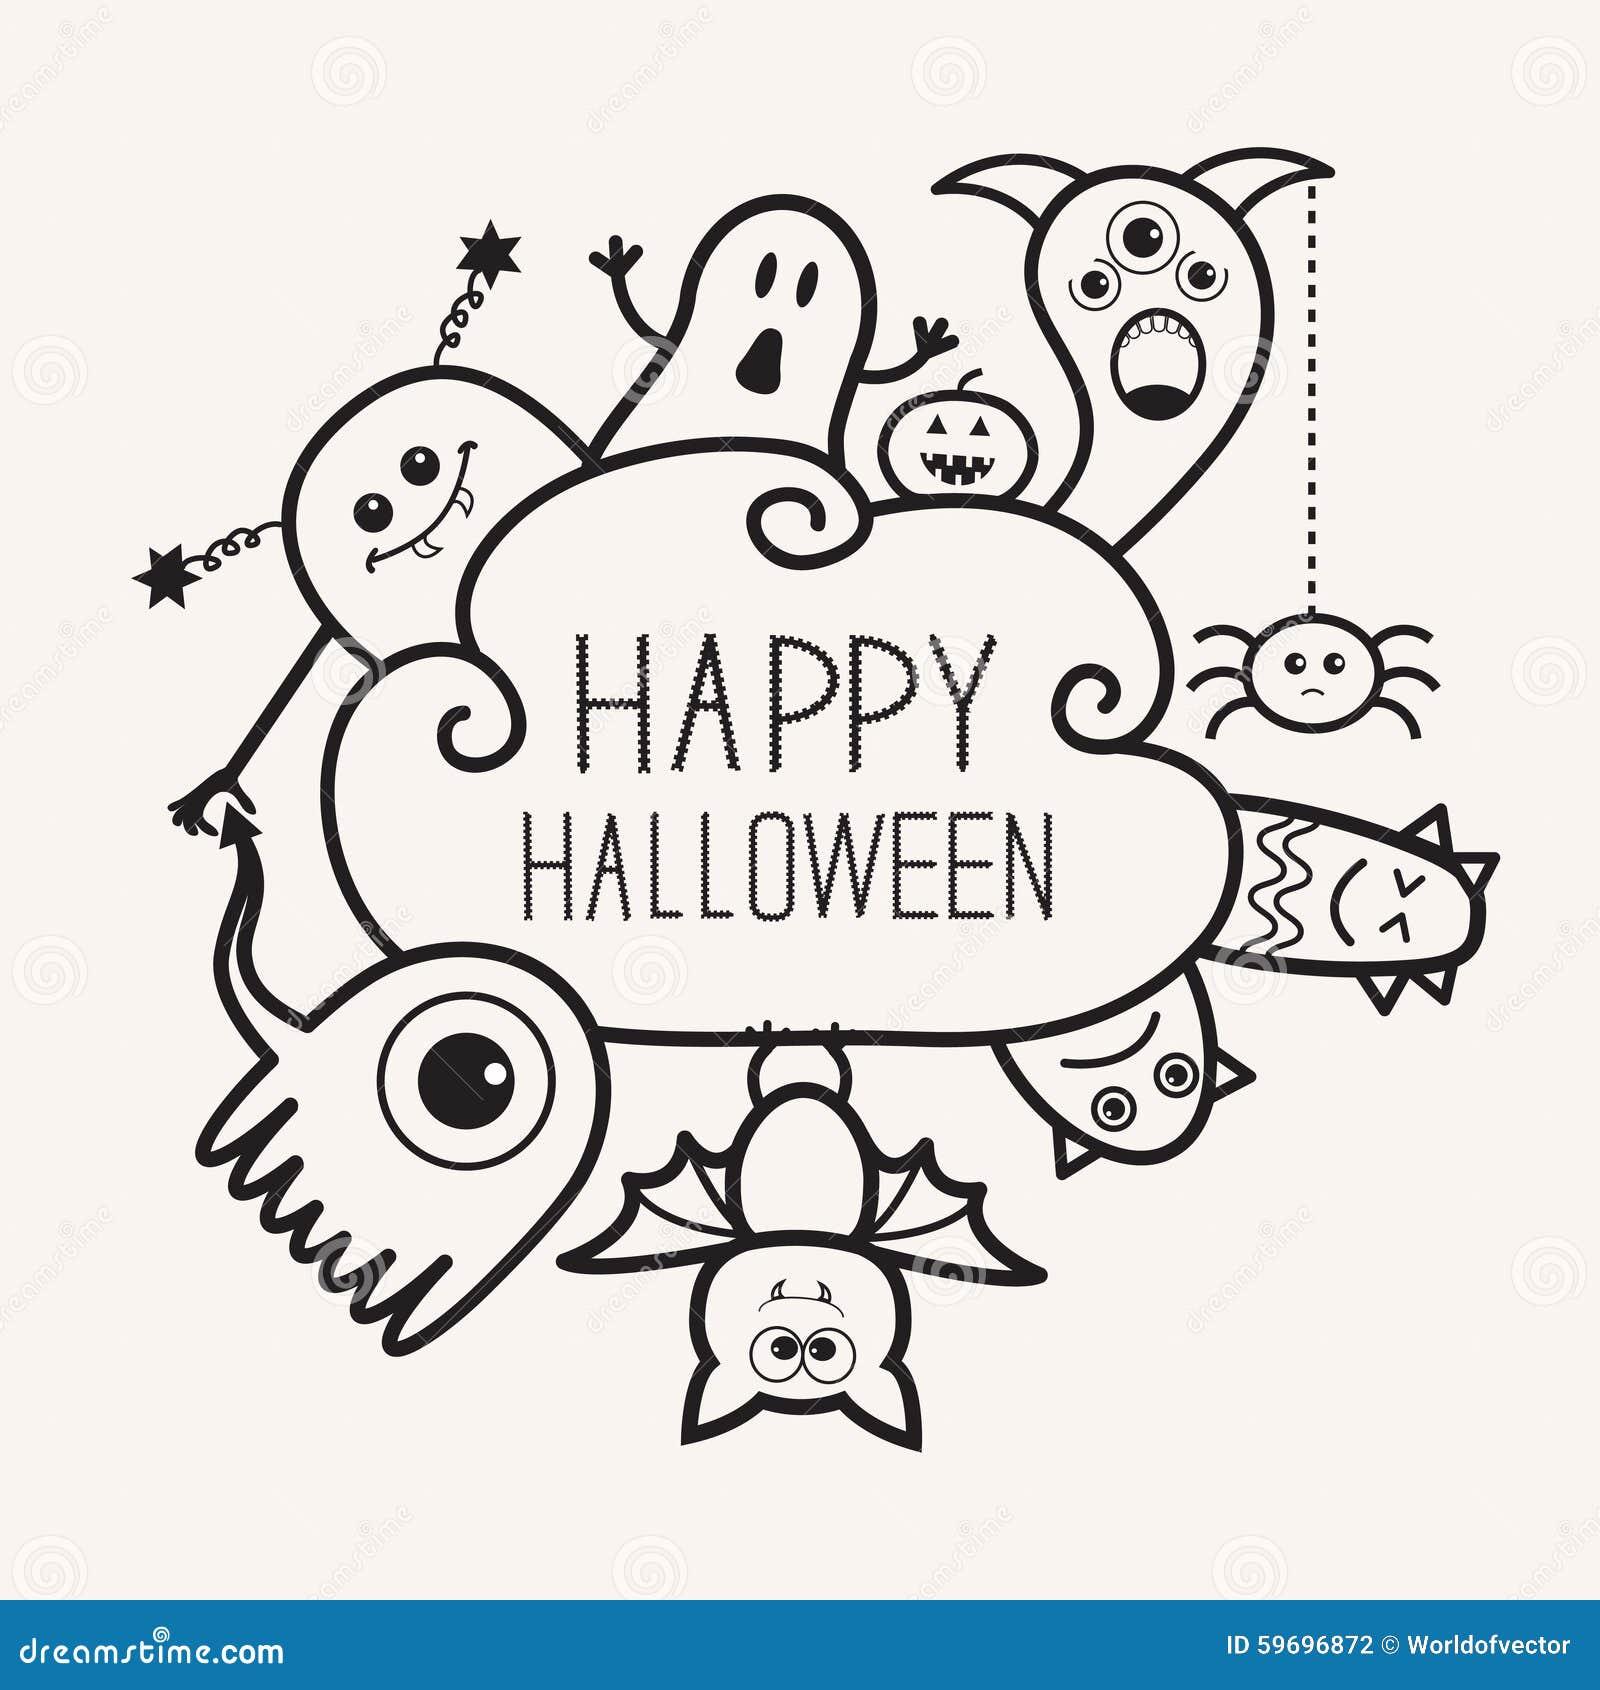 Asombroso Feliz Halloween Calabaza Para Colorear Friso - Dibujos ...